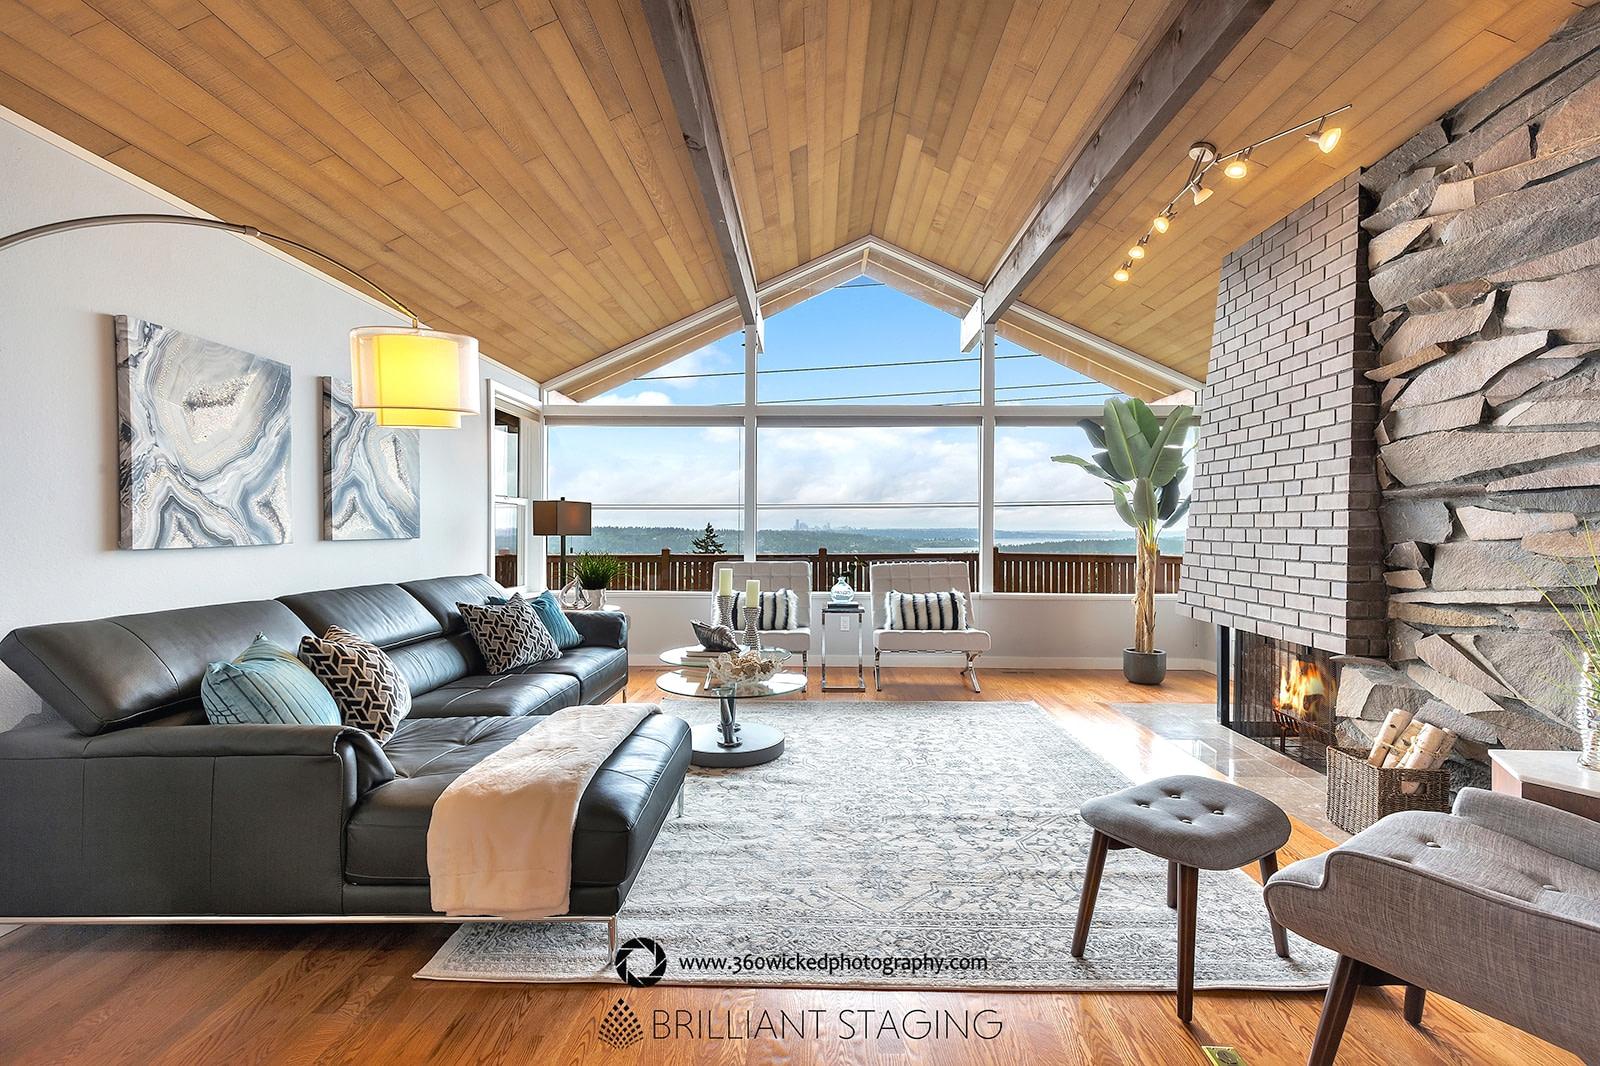 The man living room